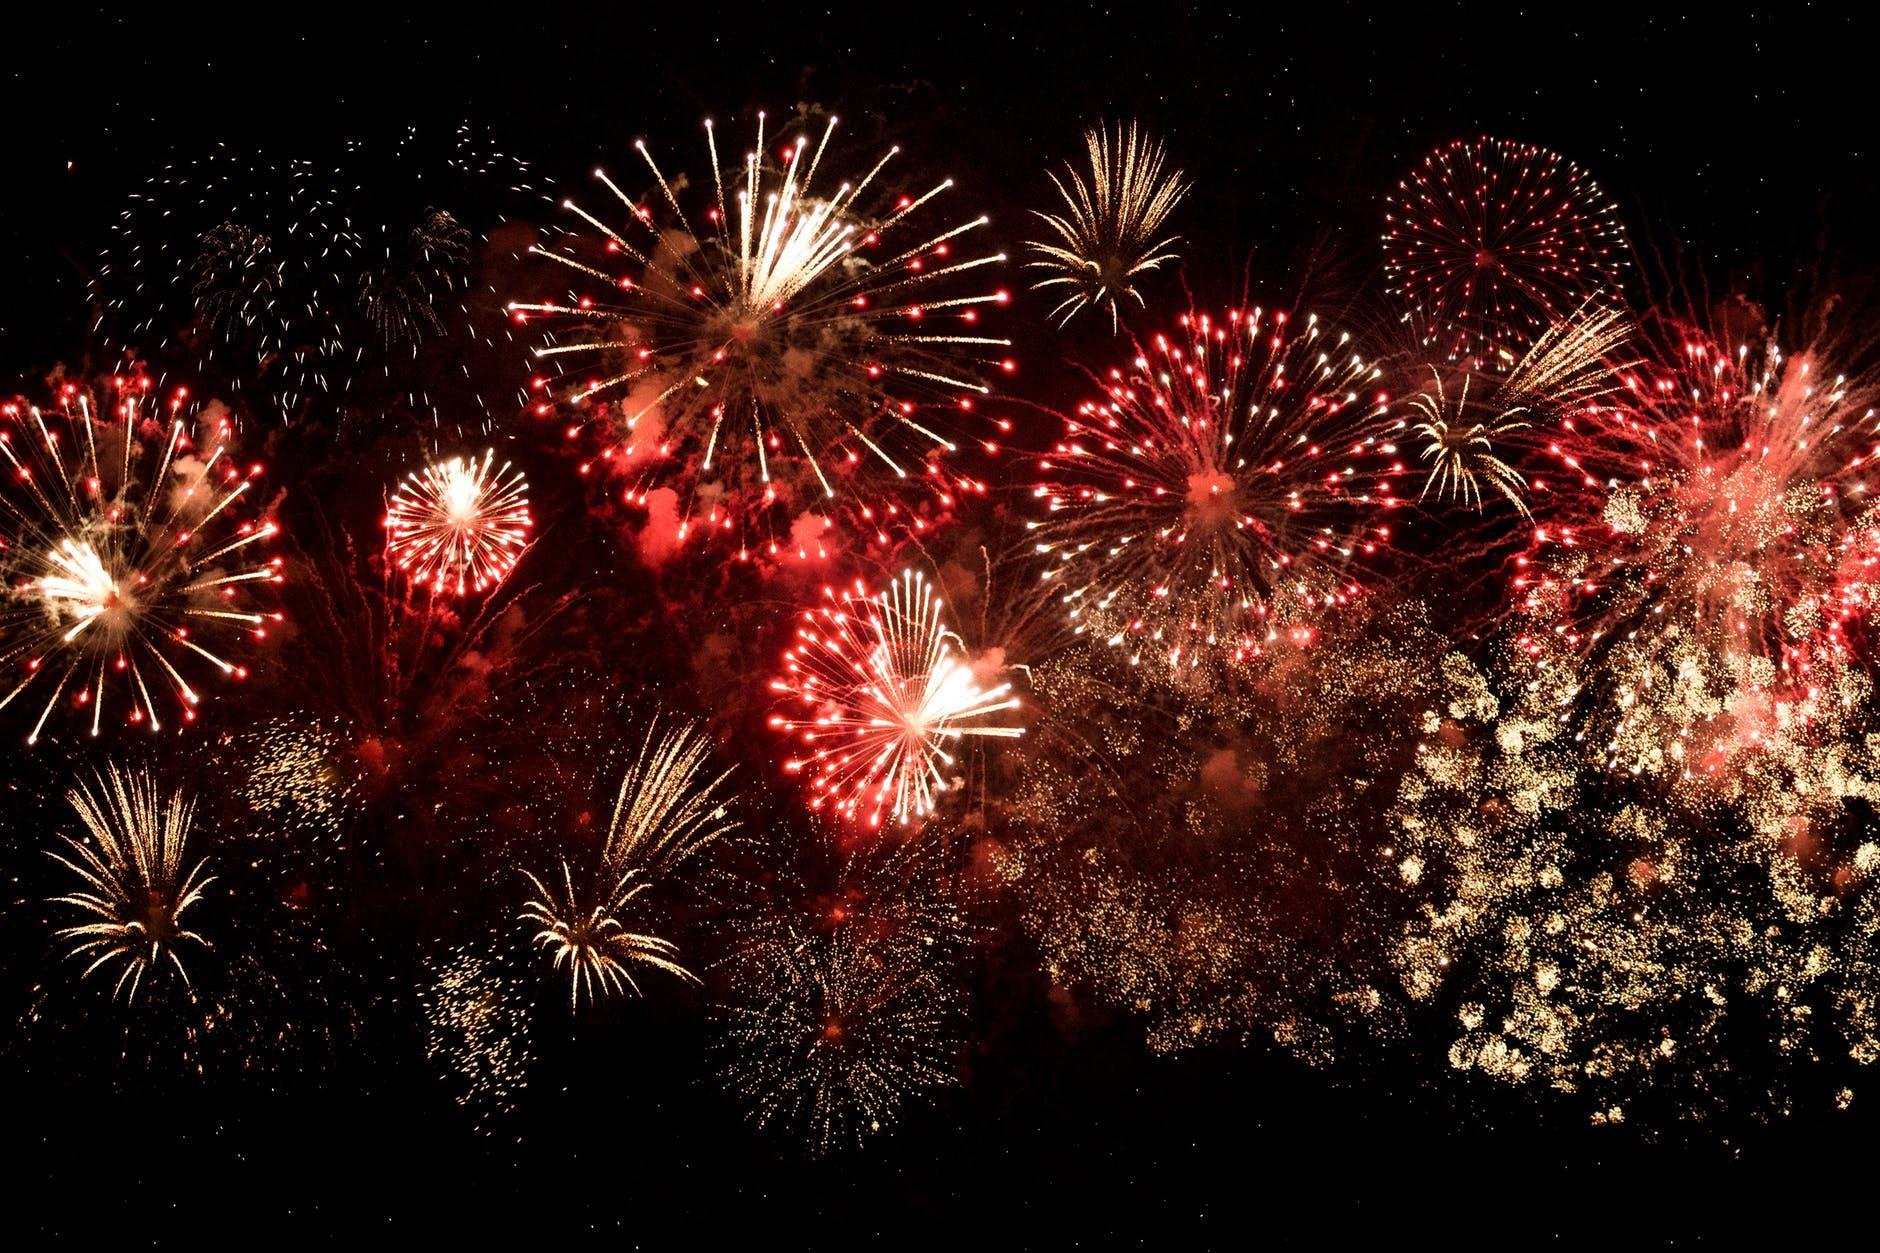 photo of fireworks display